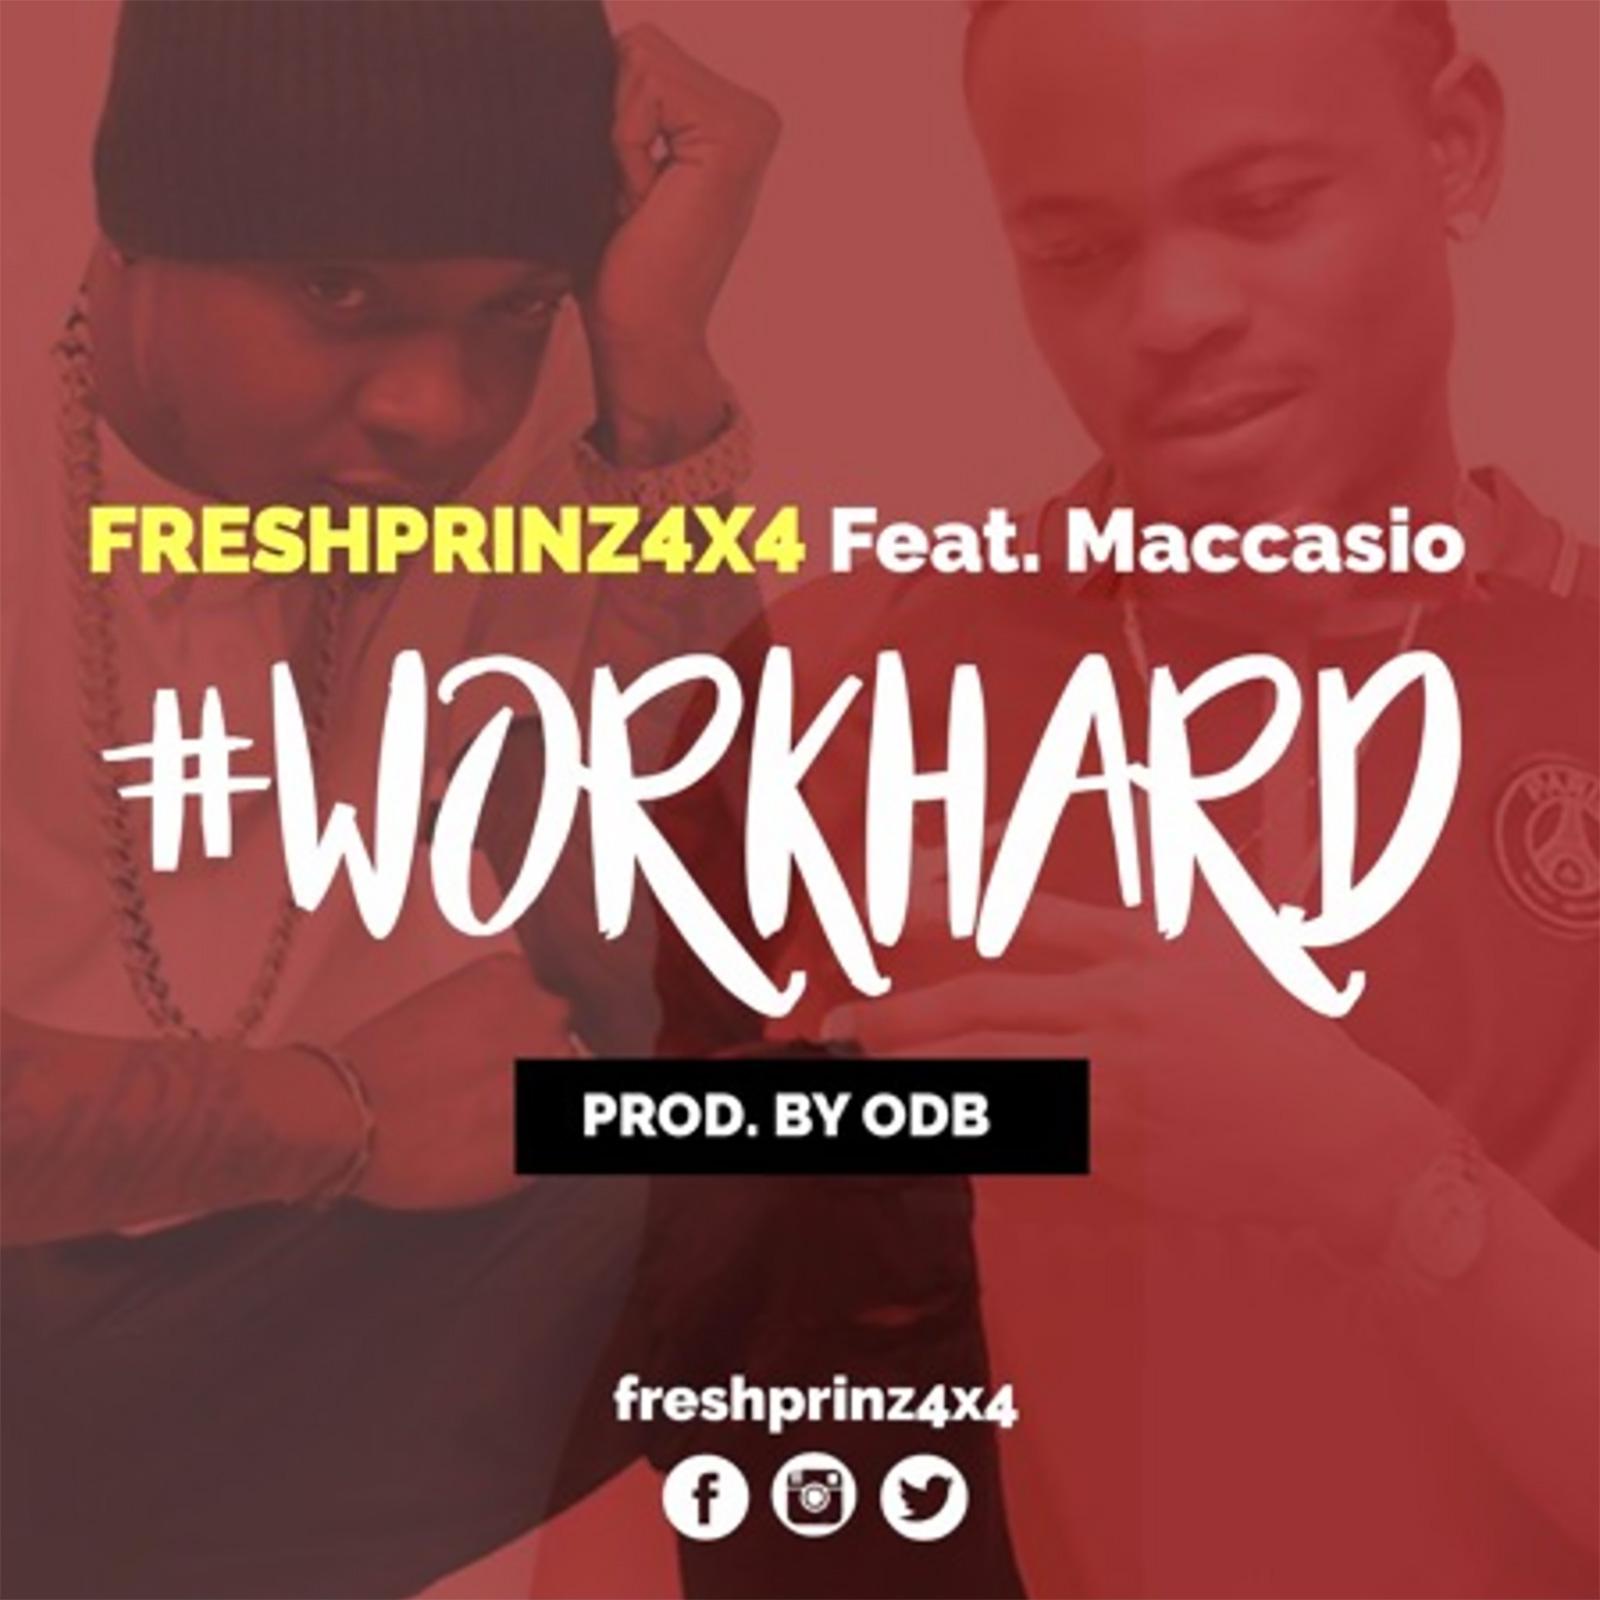 Work Hard by Fresh Prinz (4x4) feat. Maccasio